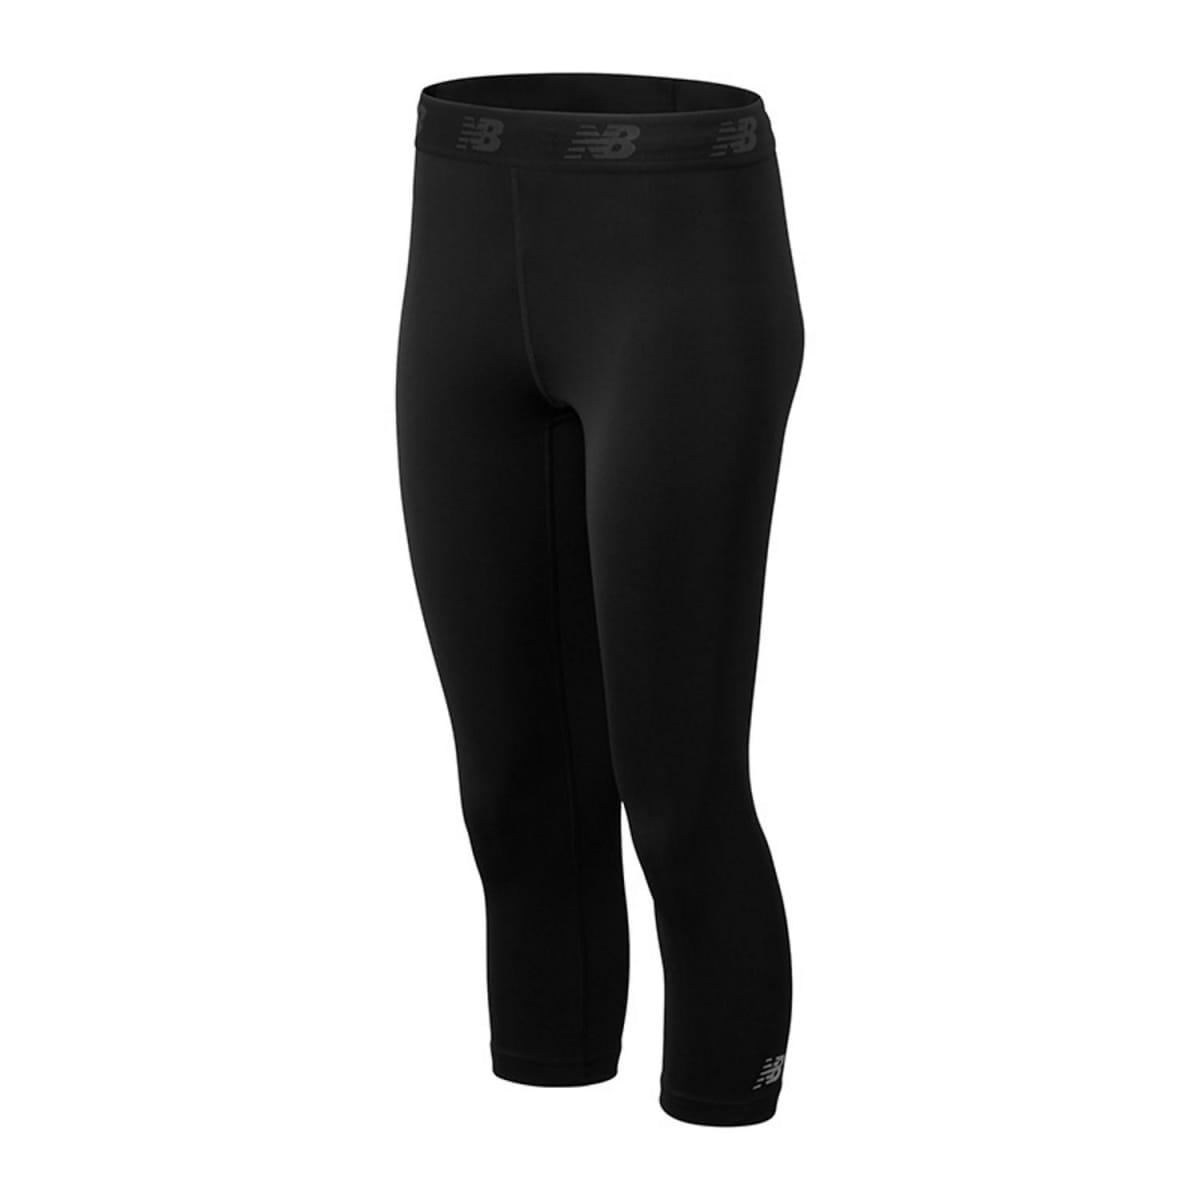 1e7a6f23584c0 Product Image. New Balance Women's Accelerate Capri